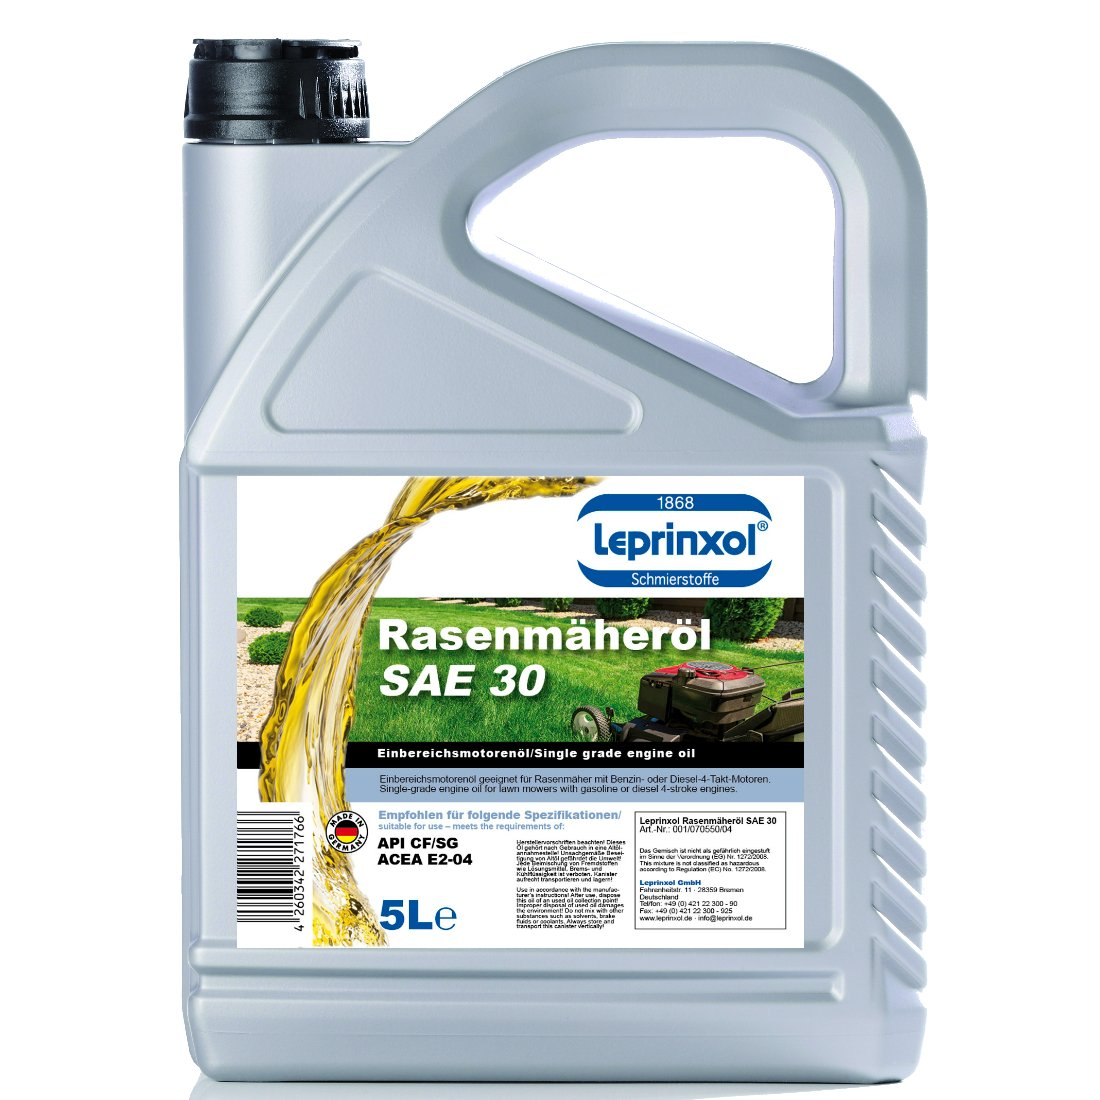 5L sae30 de 4 del 4 de T rasenmäheröl einbereichsöl ...